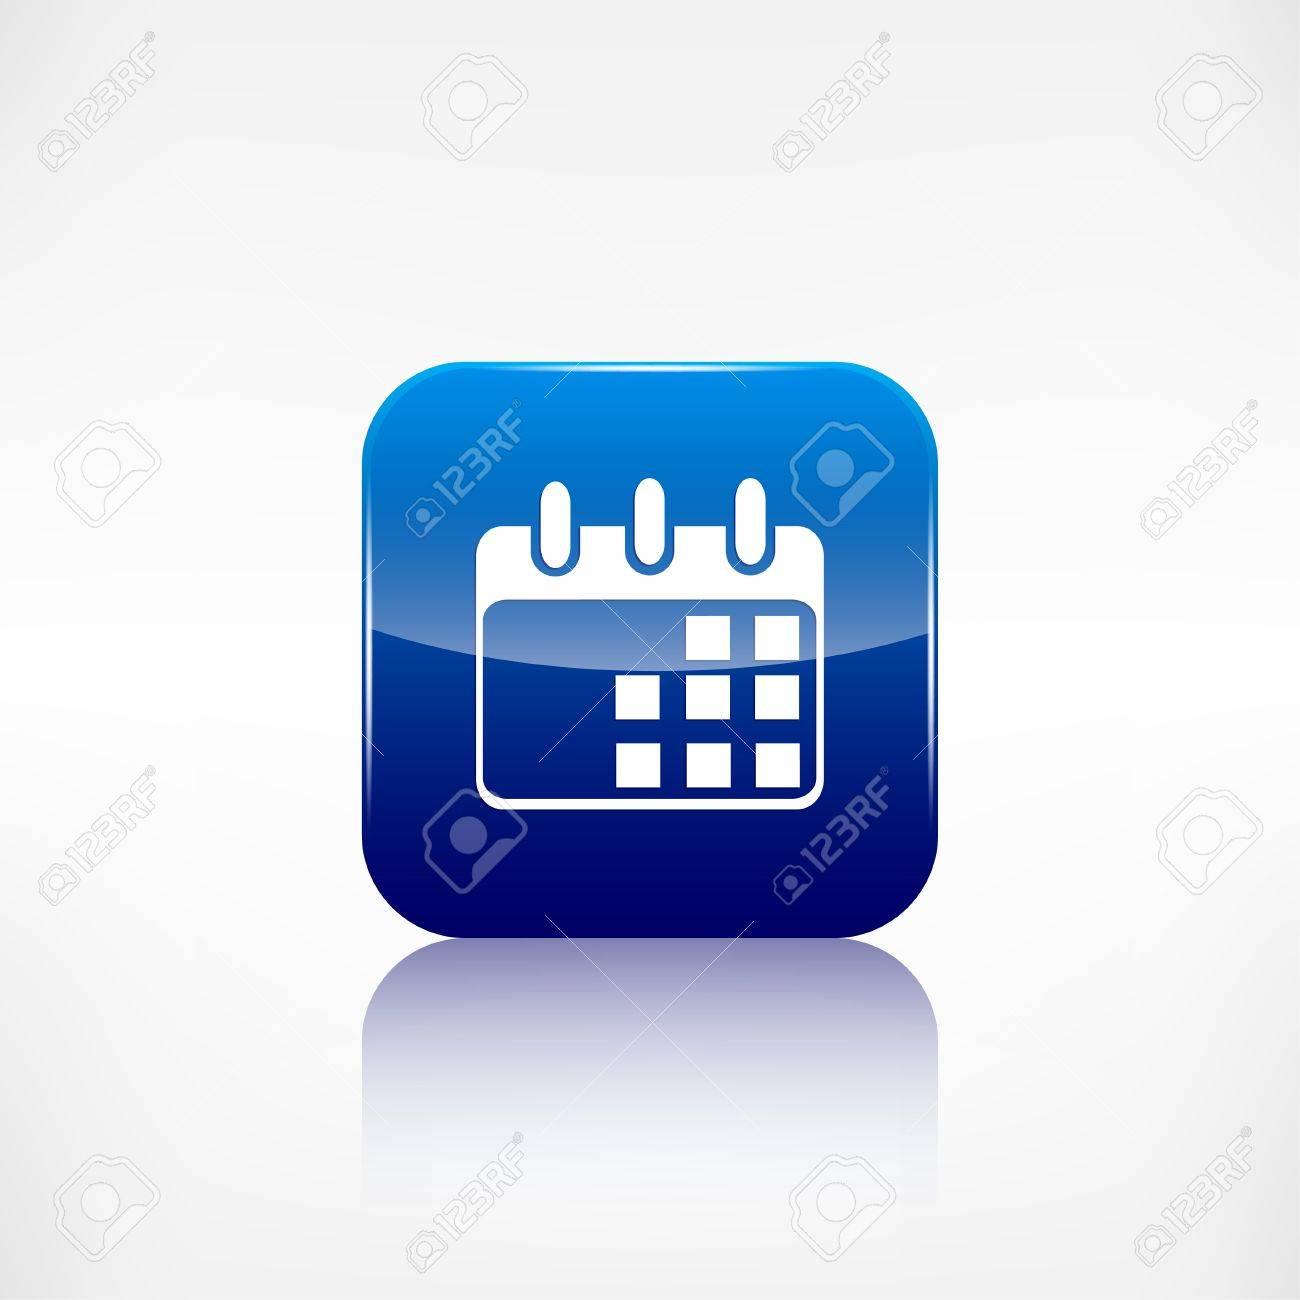 Calendar Organizer Icon. Date Symbol Royalty Free Cliparts ...